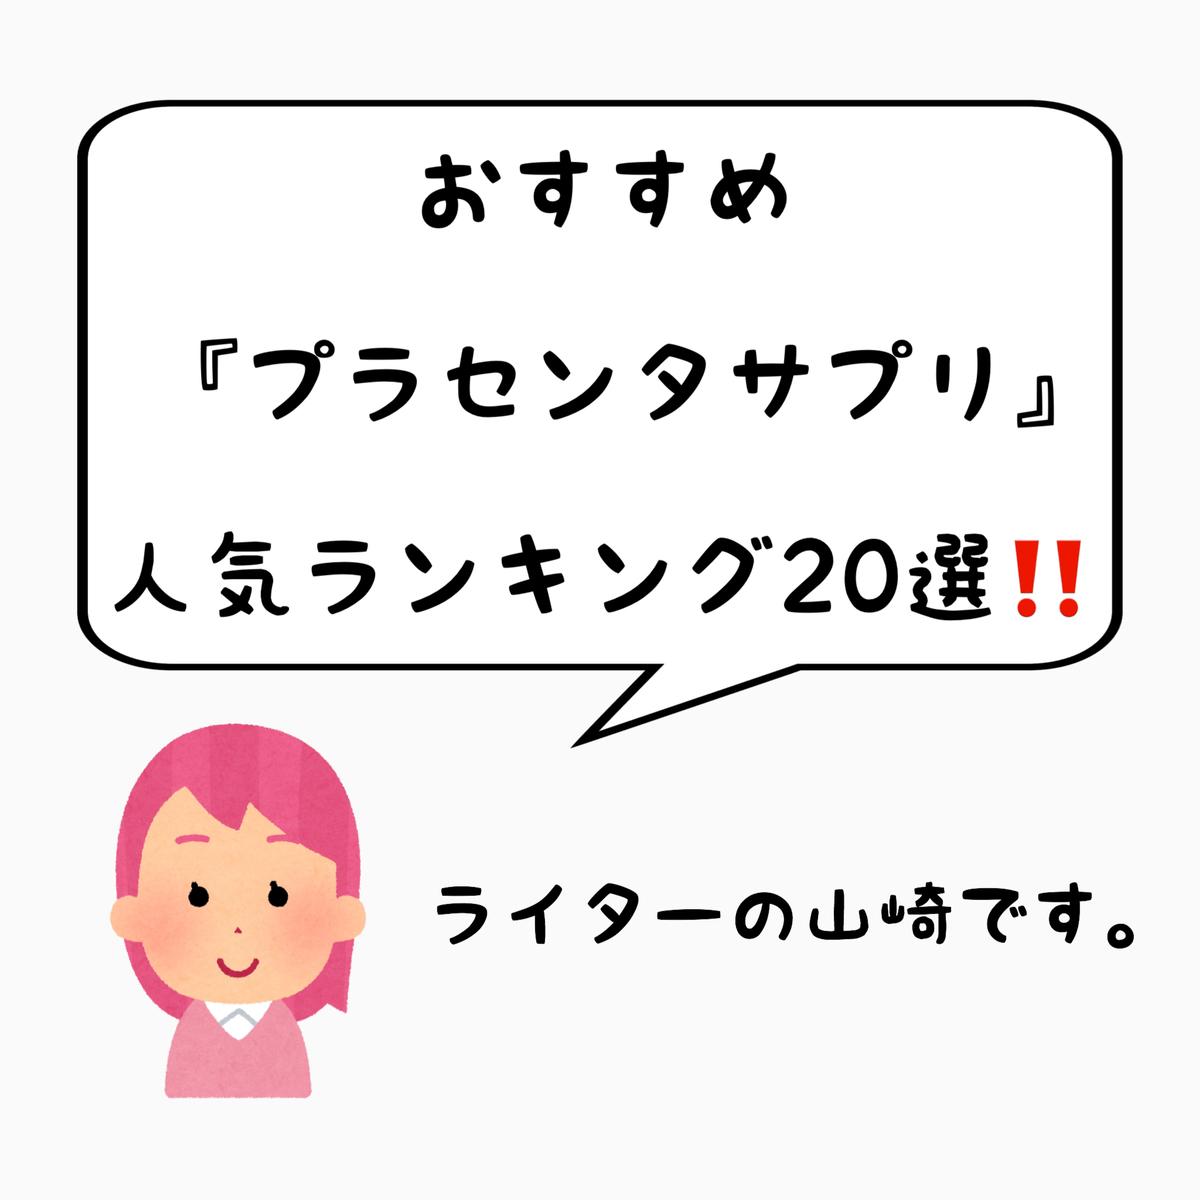 f:id:nokonoko_o:20210114112419j:plain